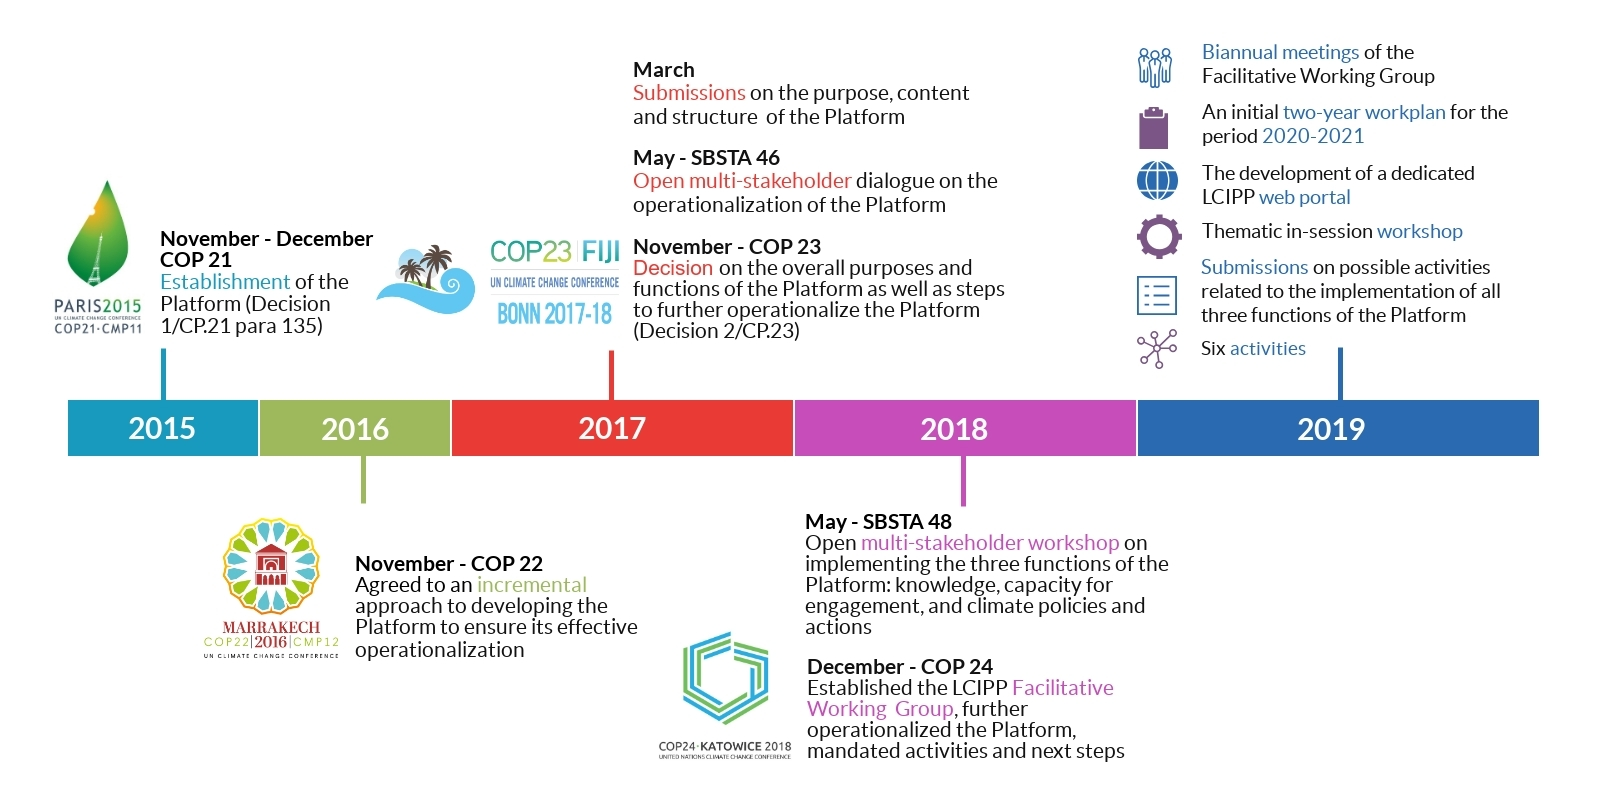 Timeline-LCIPP rev3.jpg